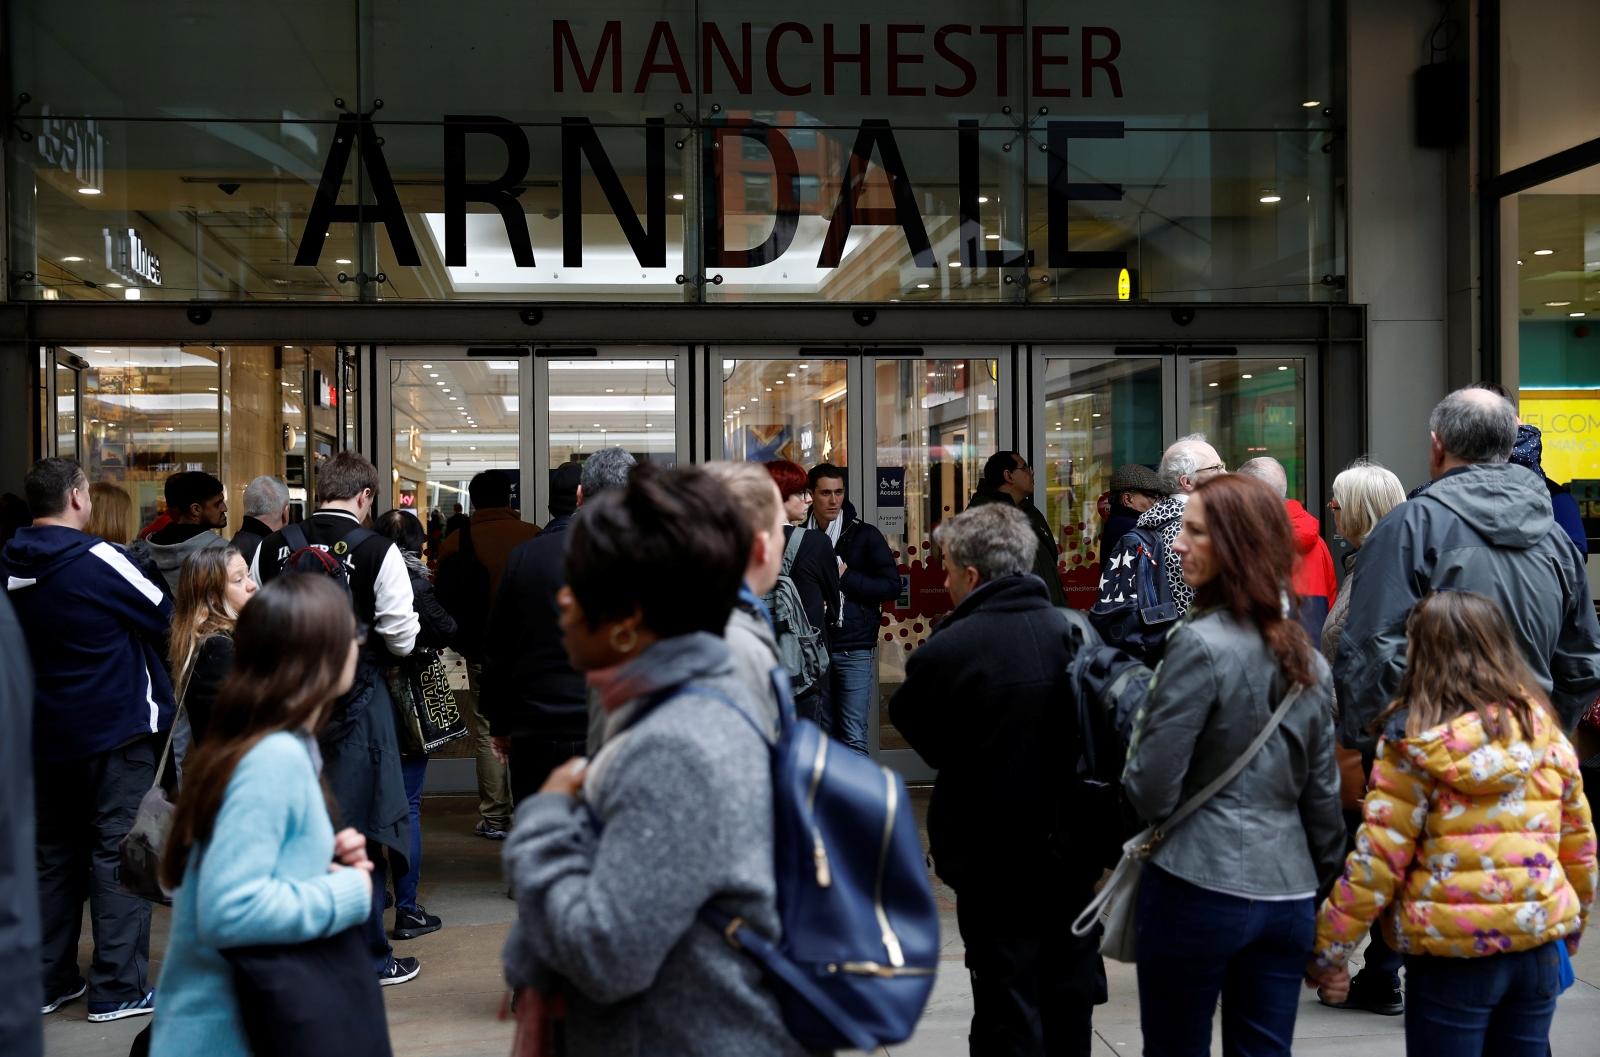 Arndale Center in Manchester